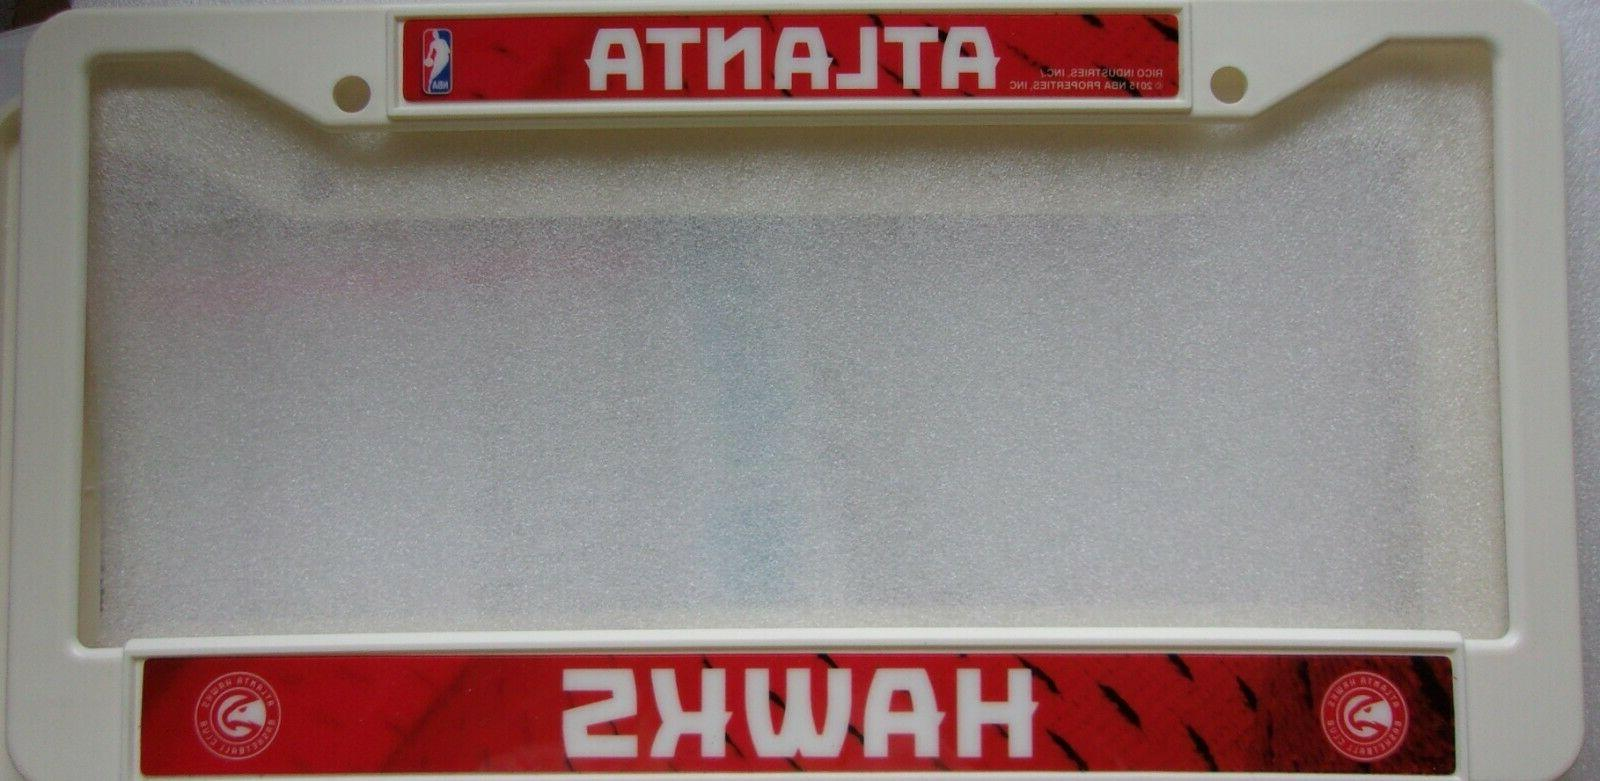 atlanta hawks plastic license plate frame 930